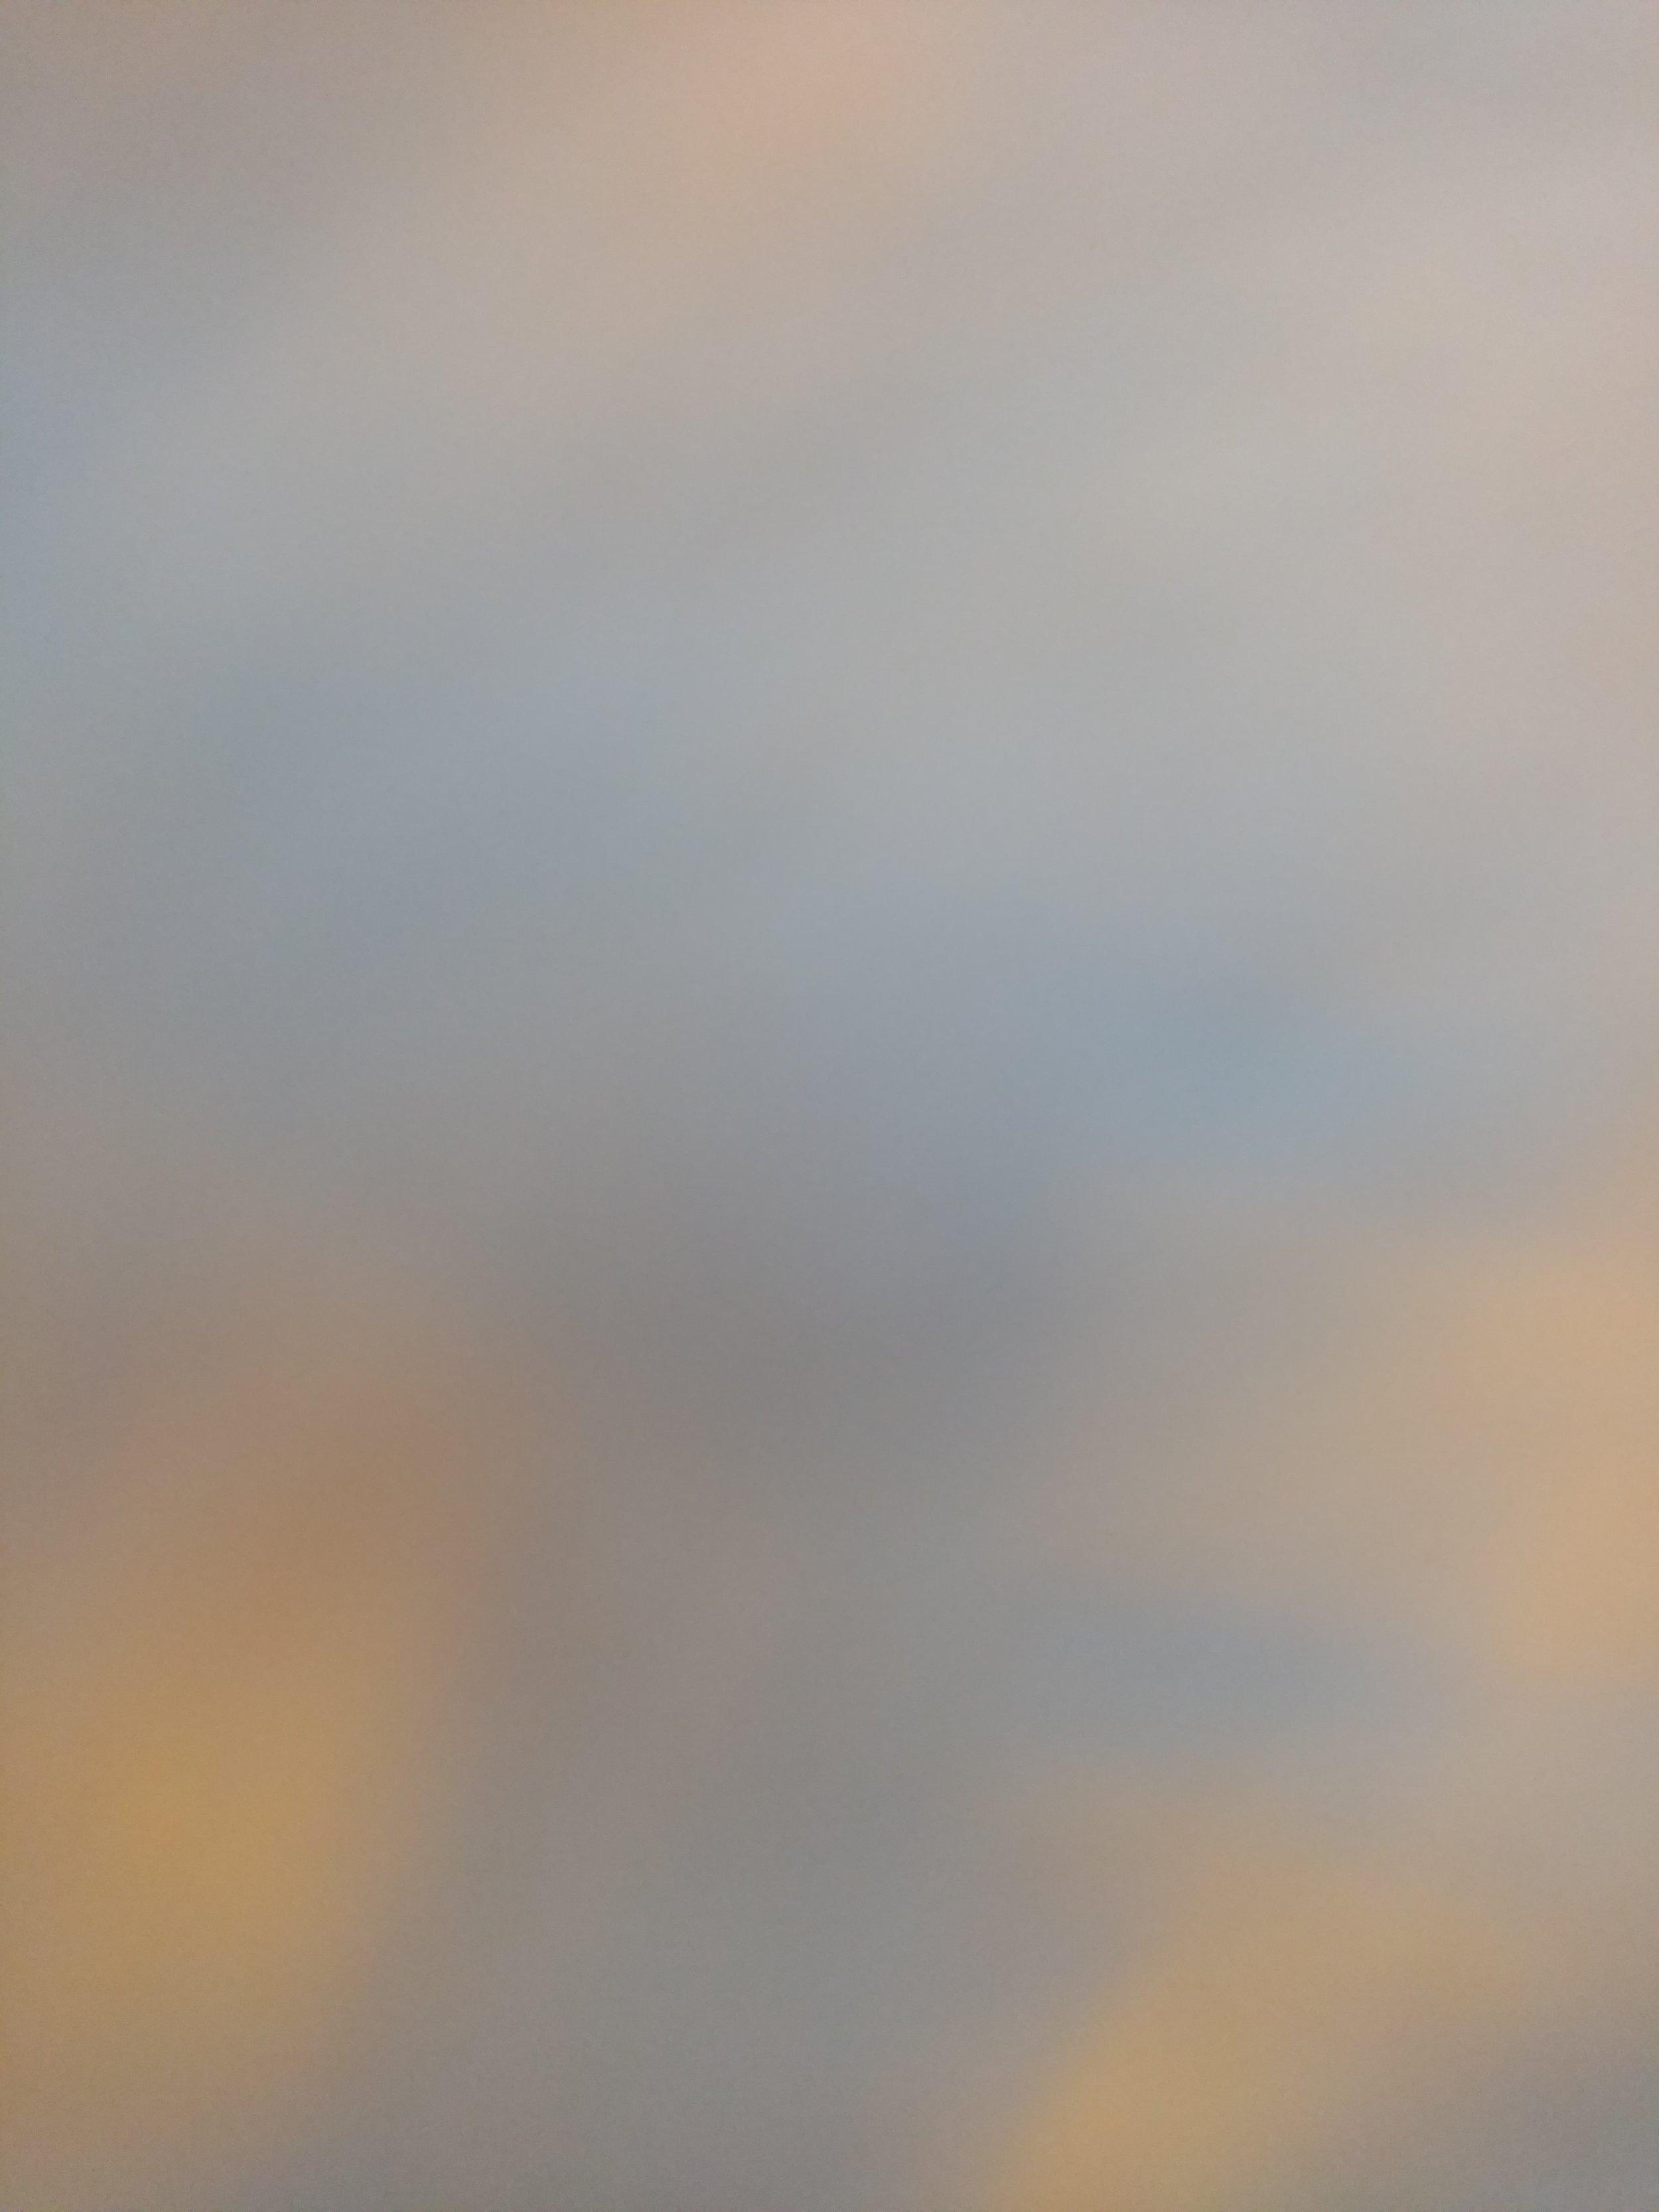 willroth-co-free-texture-gradient-052.jpg